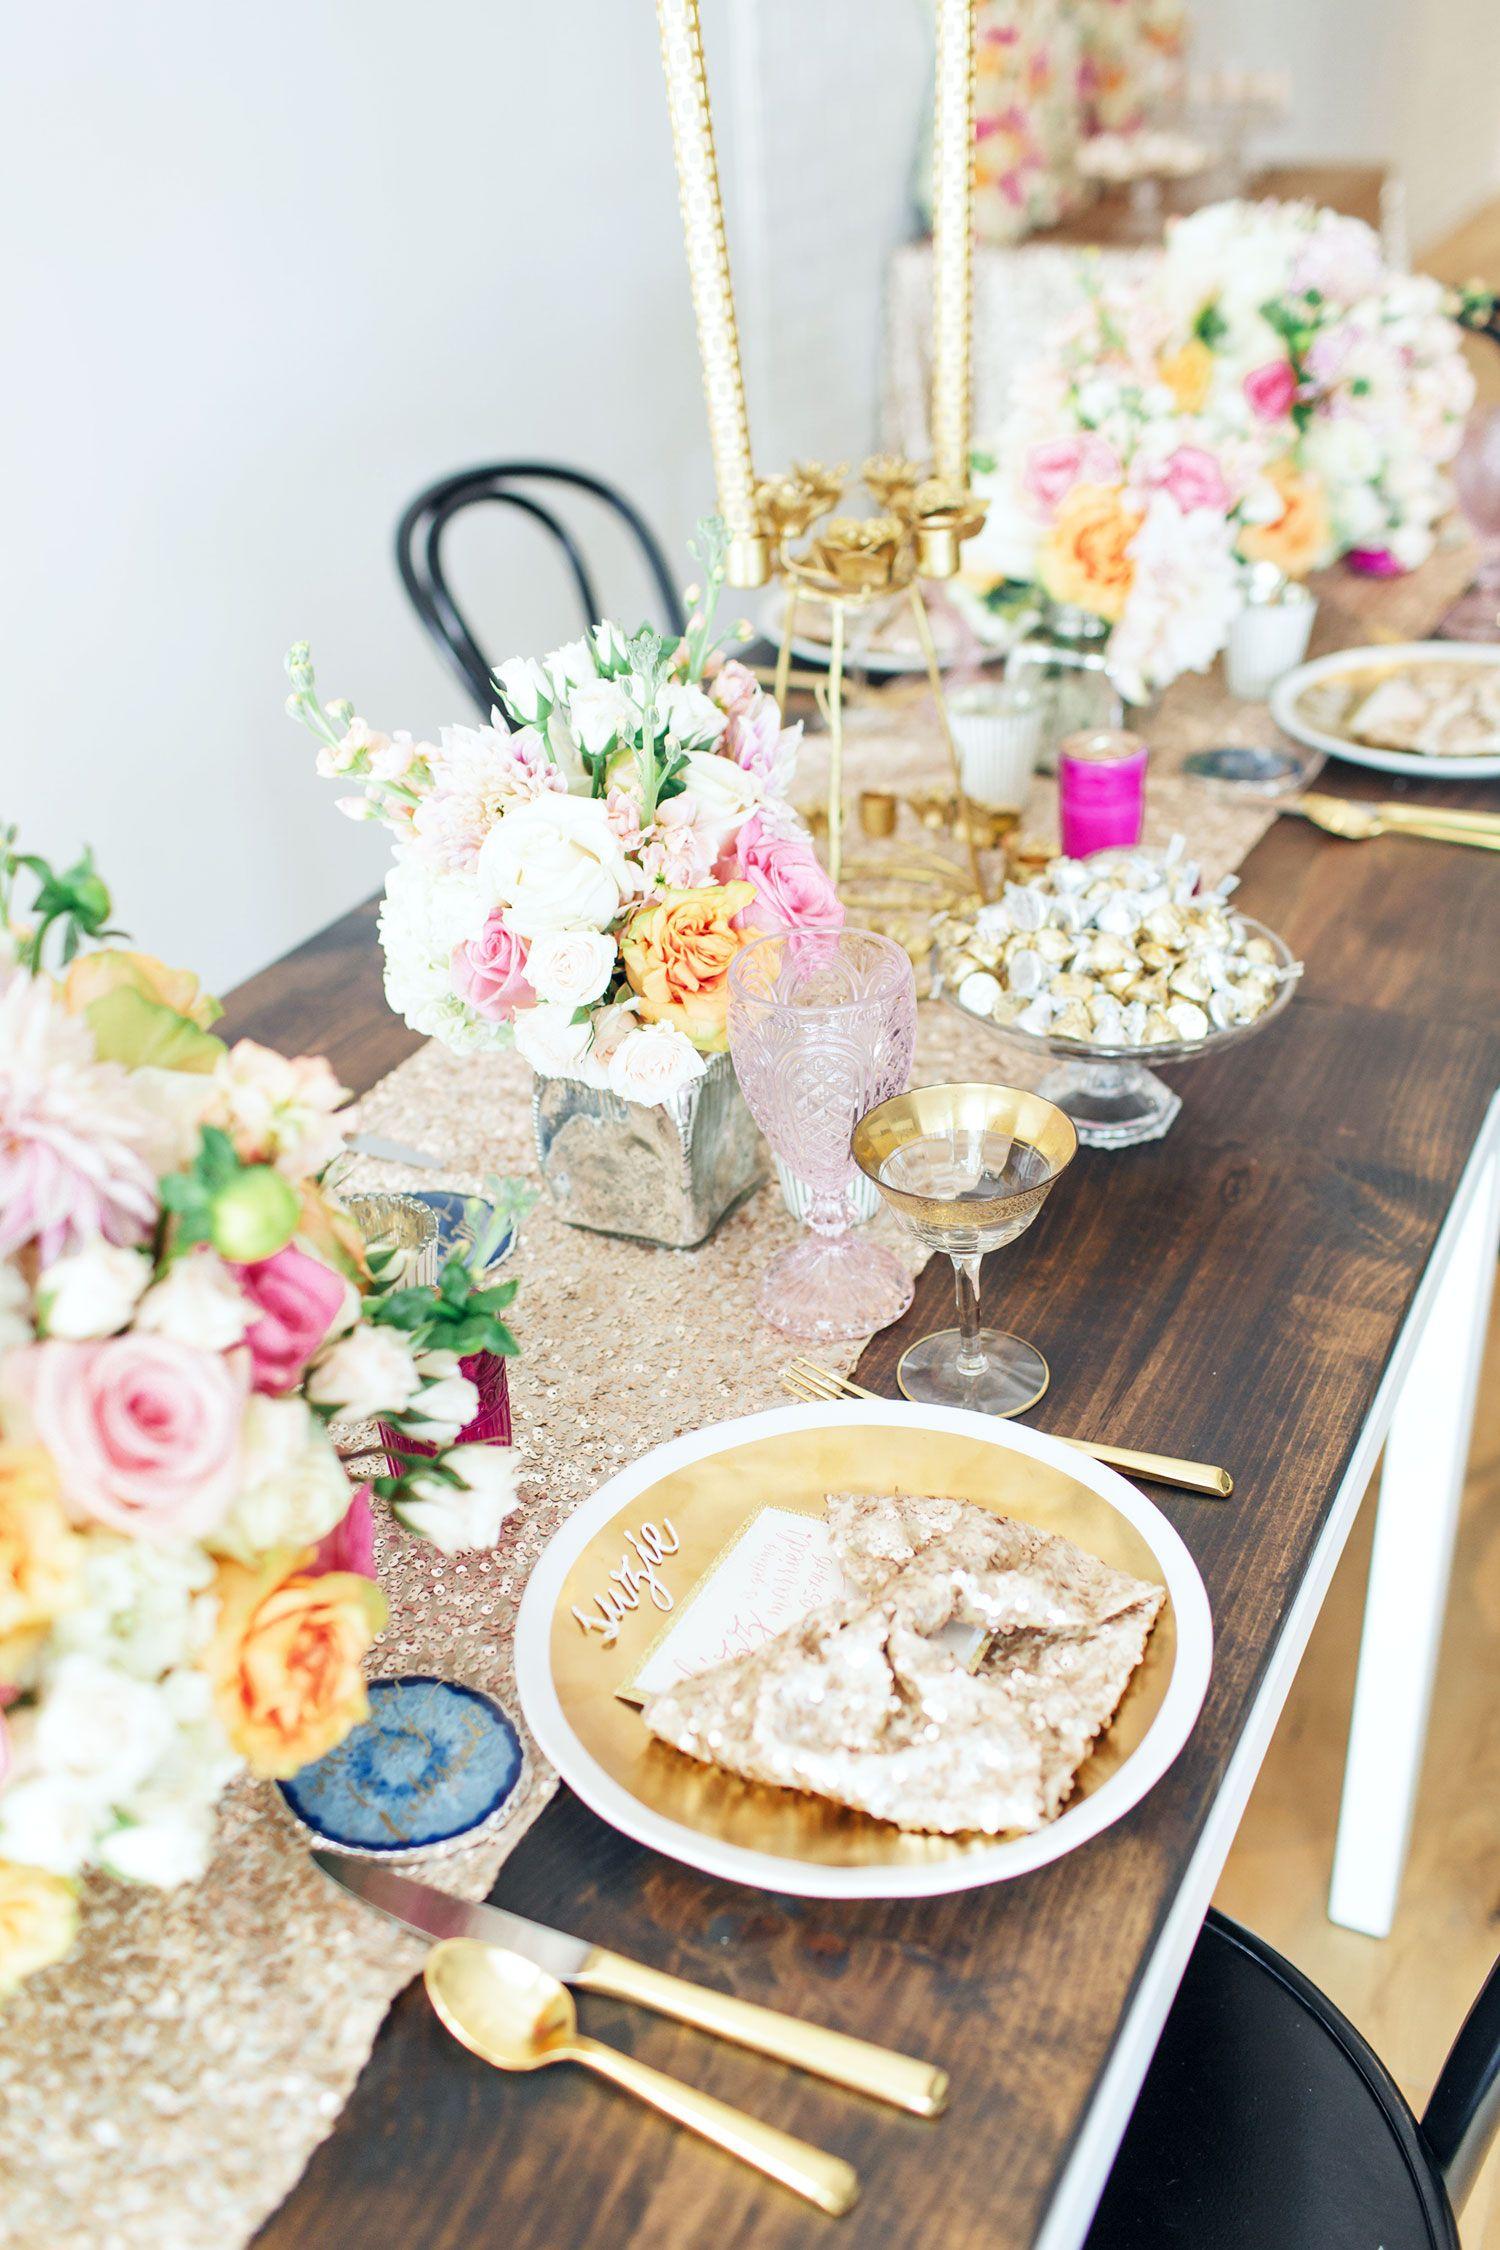 A Glamorous Bridesmaids' Brunch Rue Bridesmaid brunch